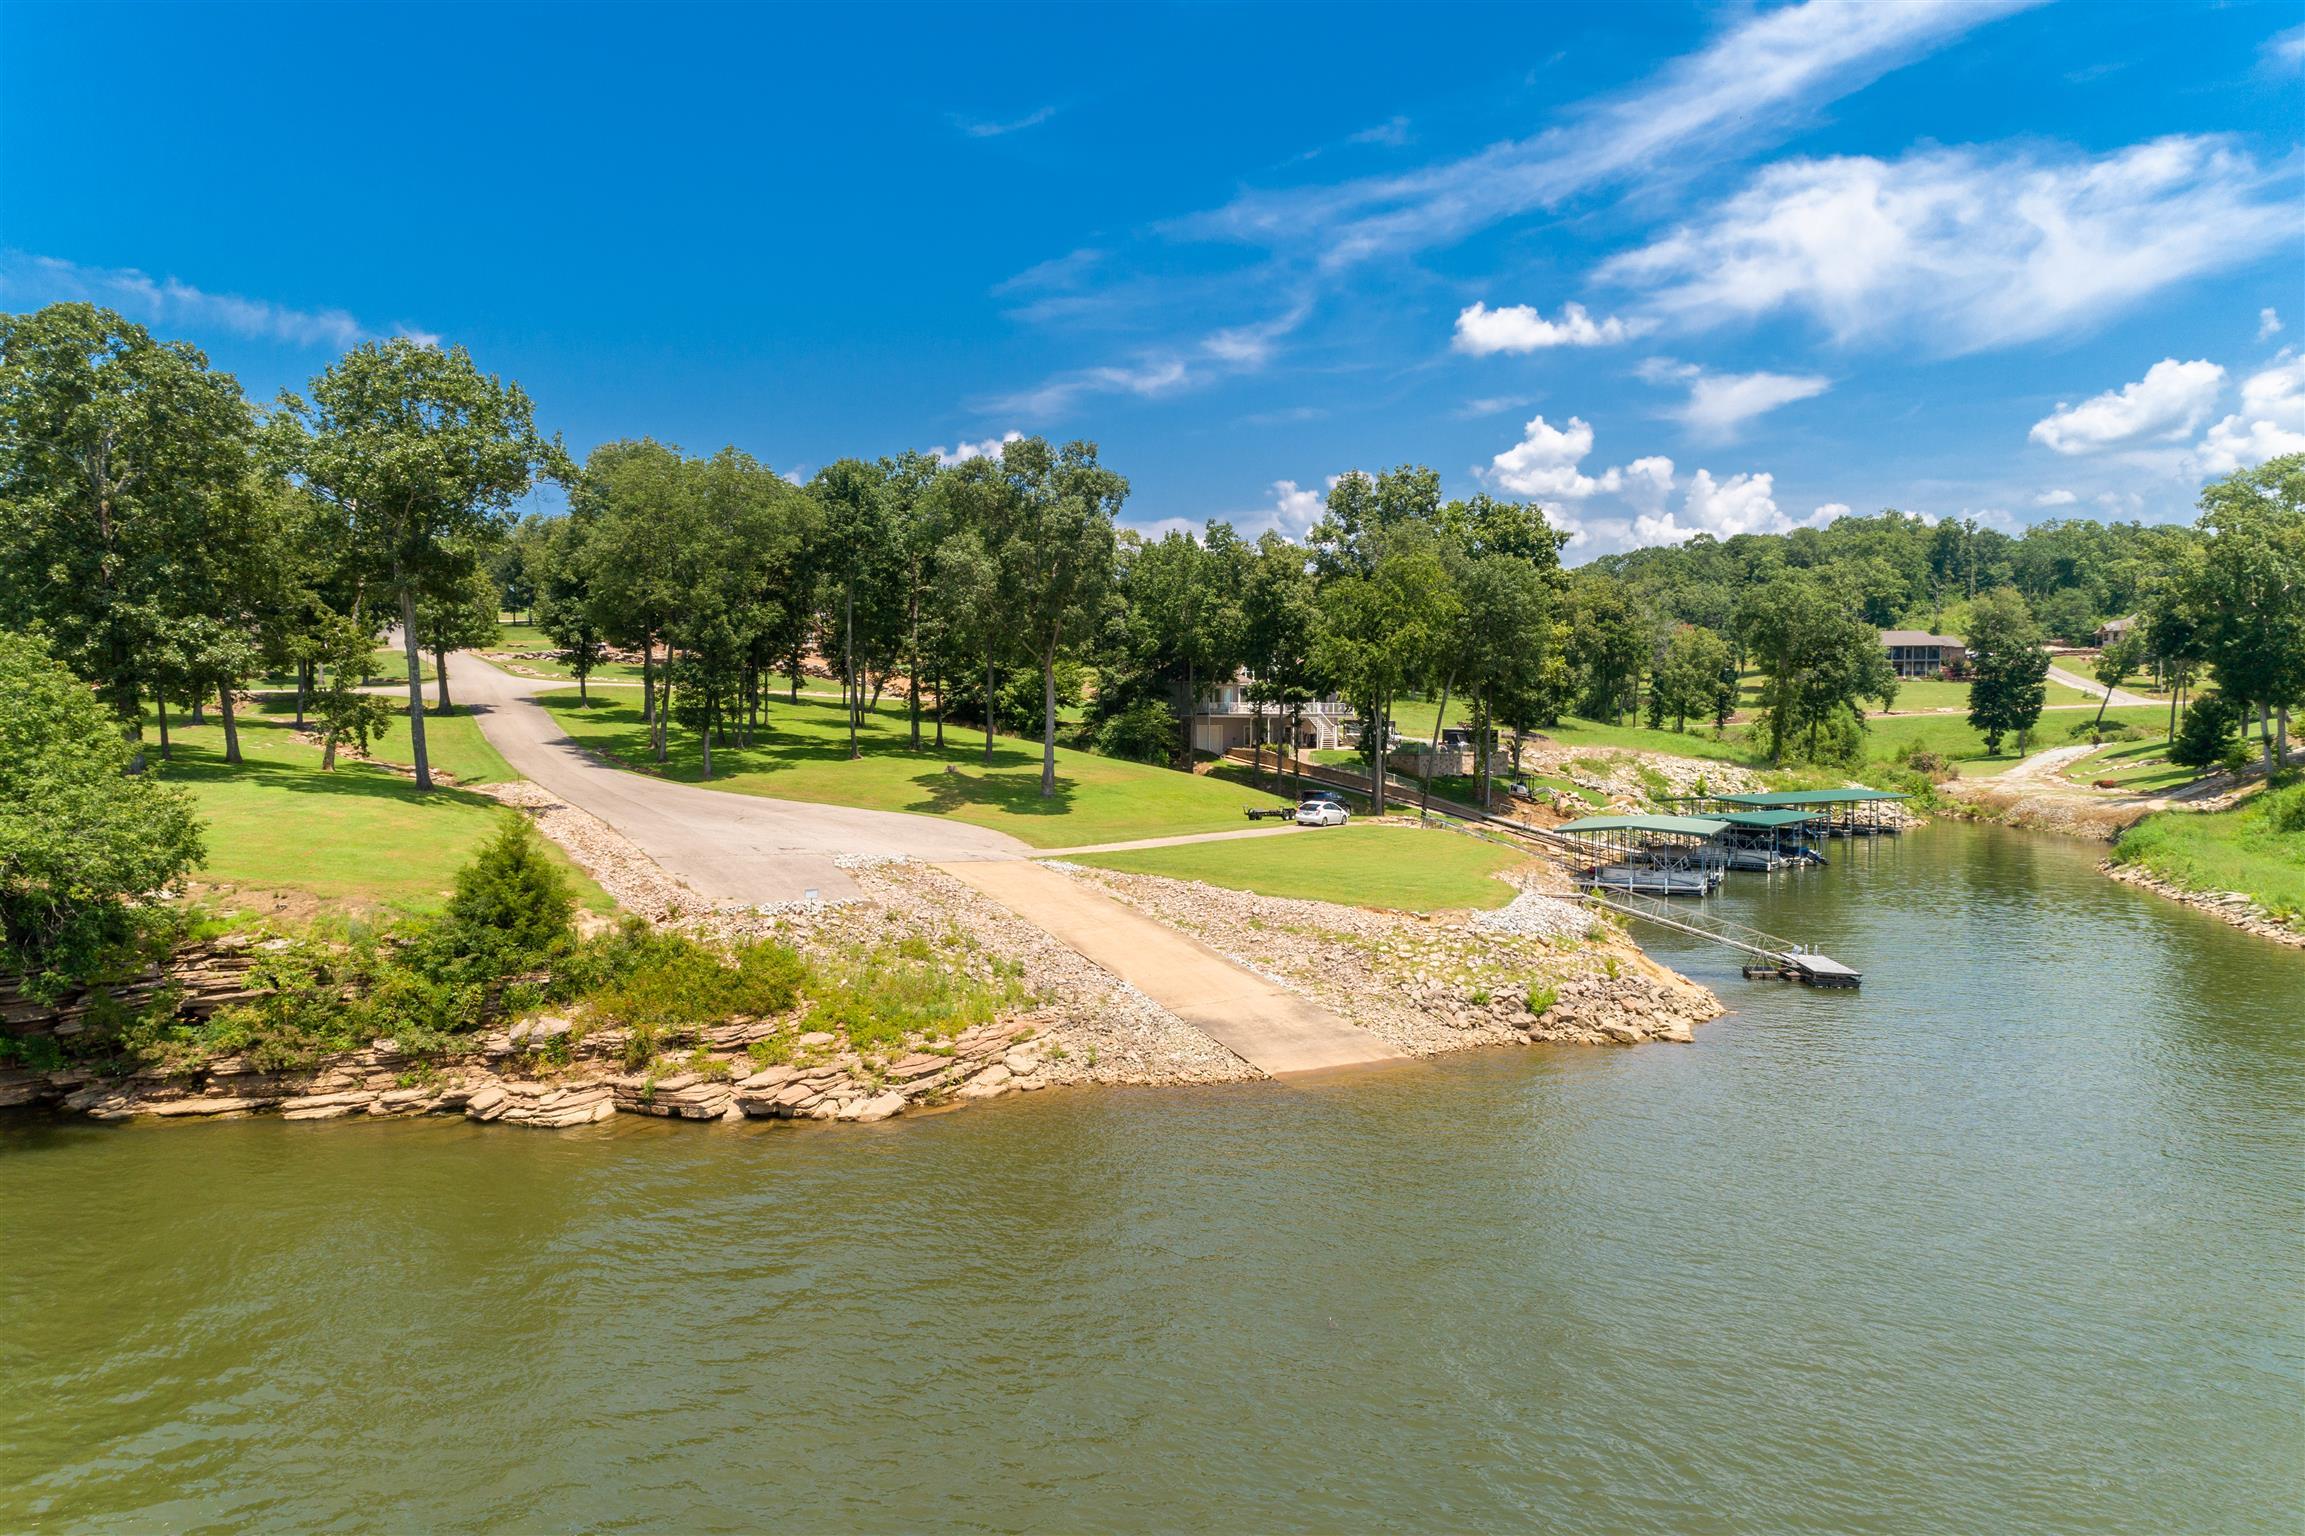 705 Rivers Edge Dr, Bath Springs, TN 38311 - Bath Springs, TN real estate listing